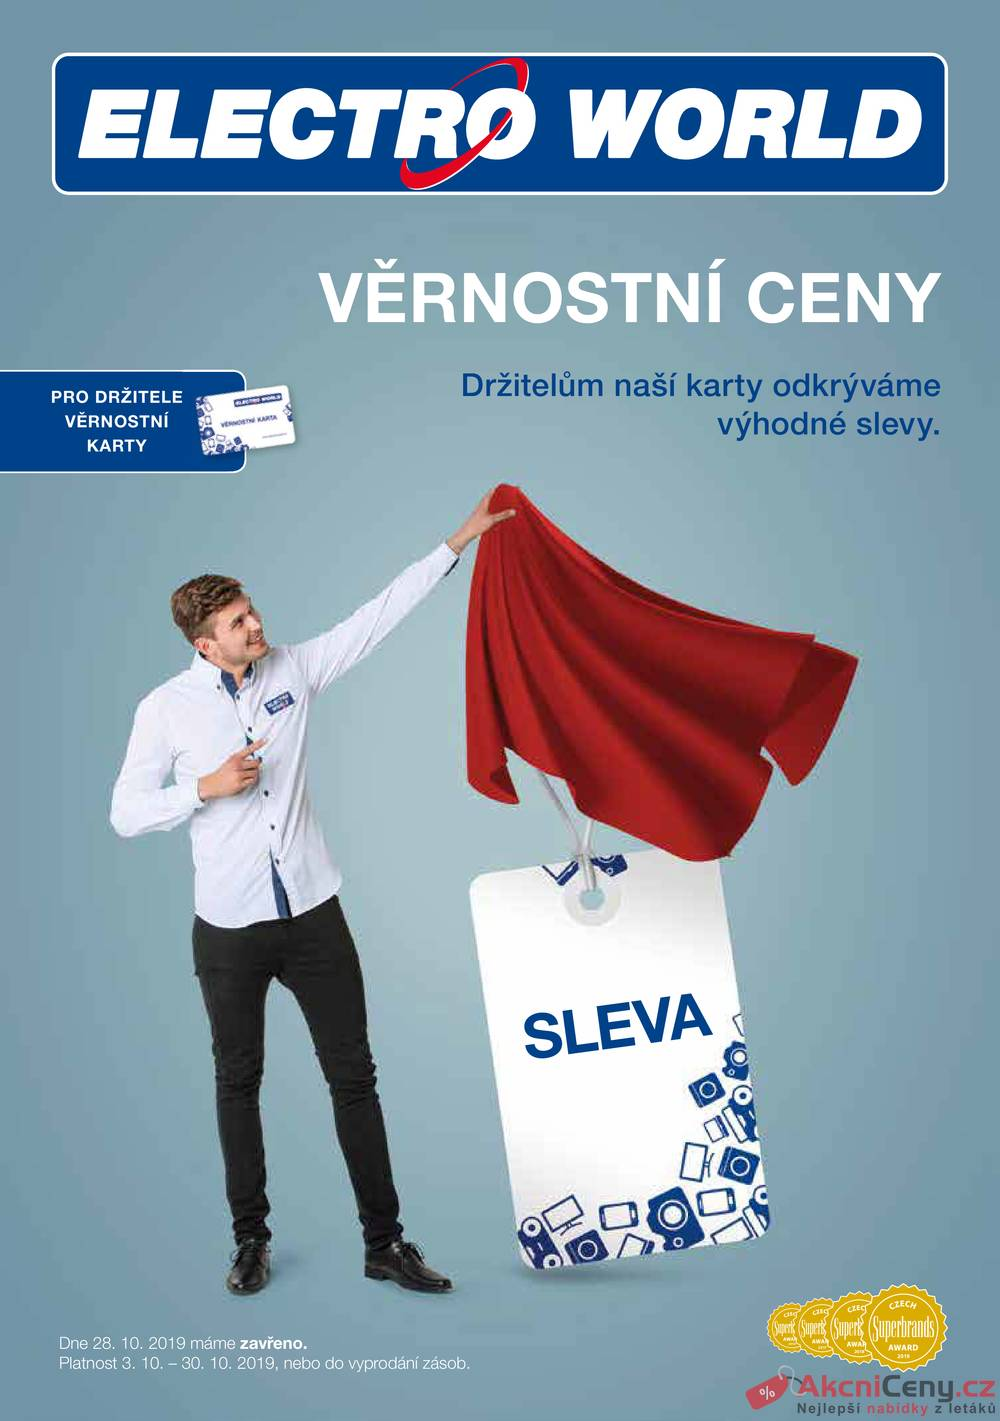 Leták Electro World - Electro World  od 3.10. do 30.10.2019 - strana 1